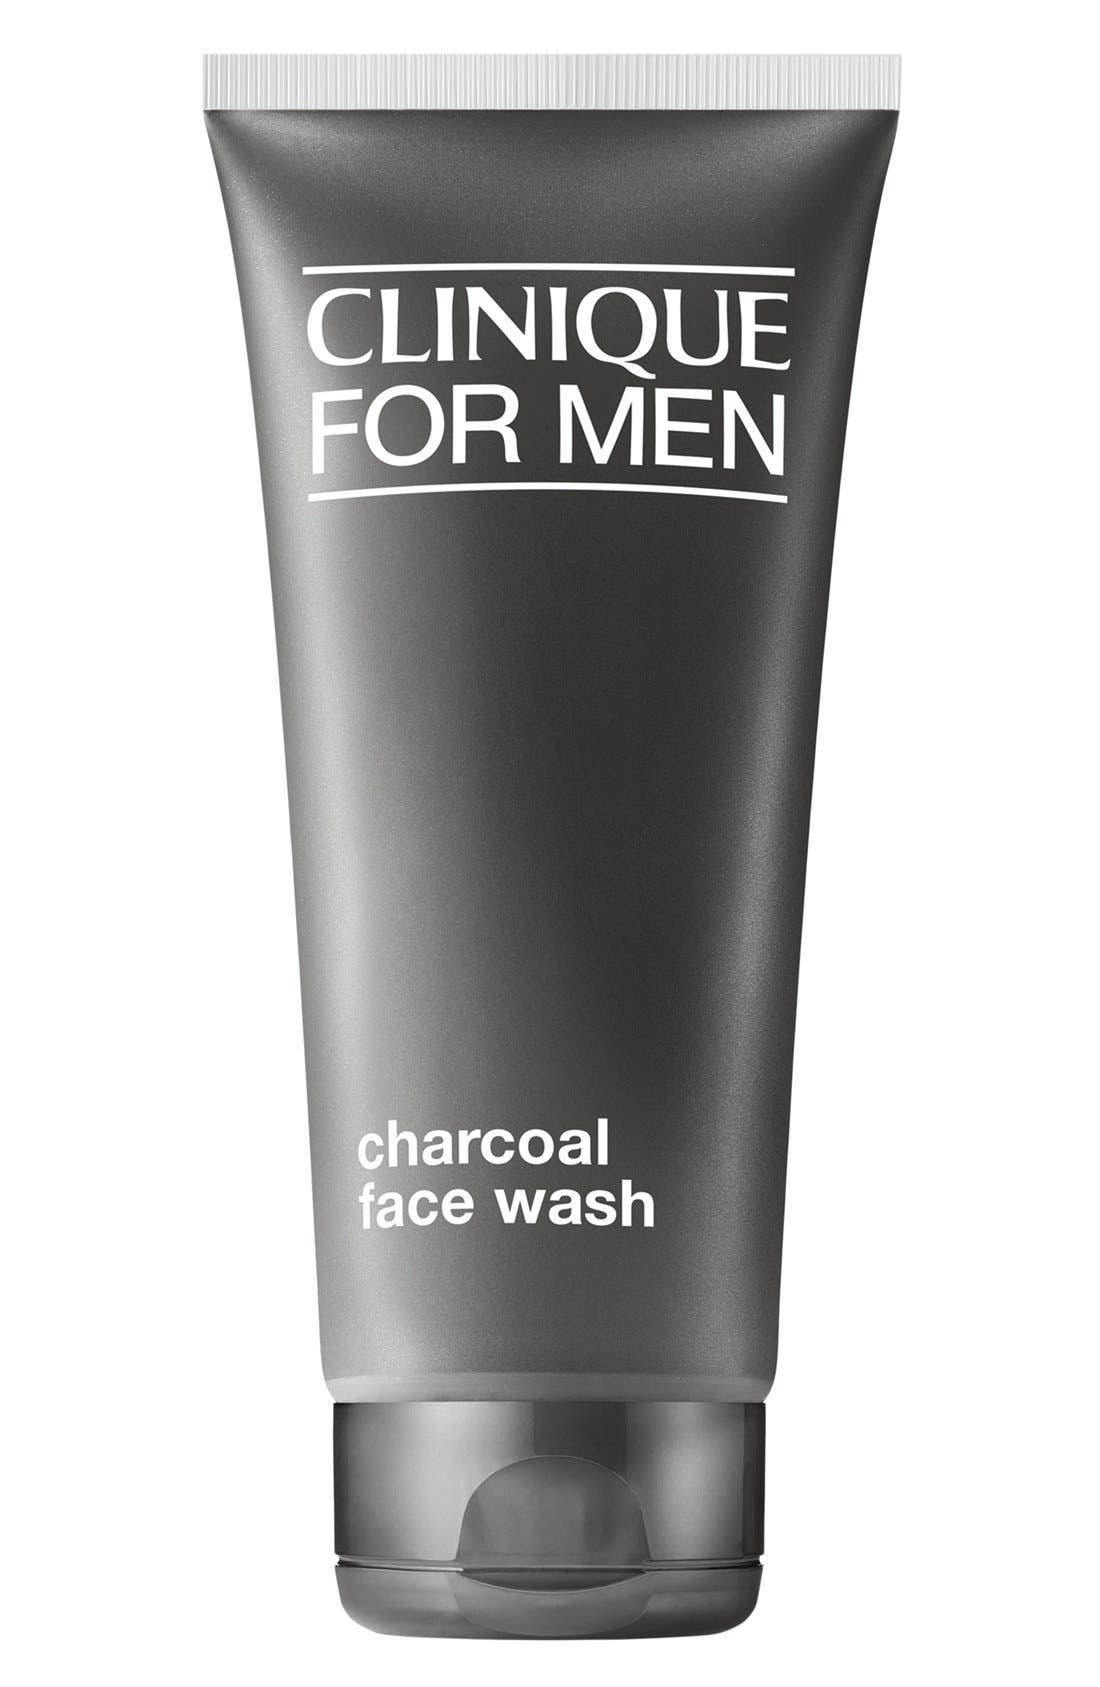 For Men Charcoal Face Wash